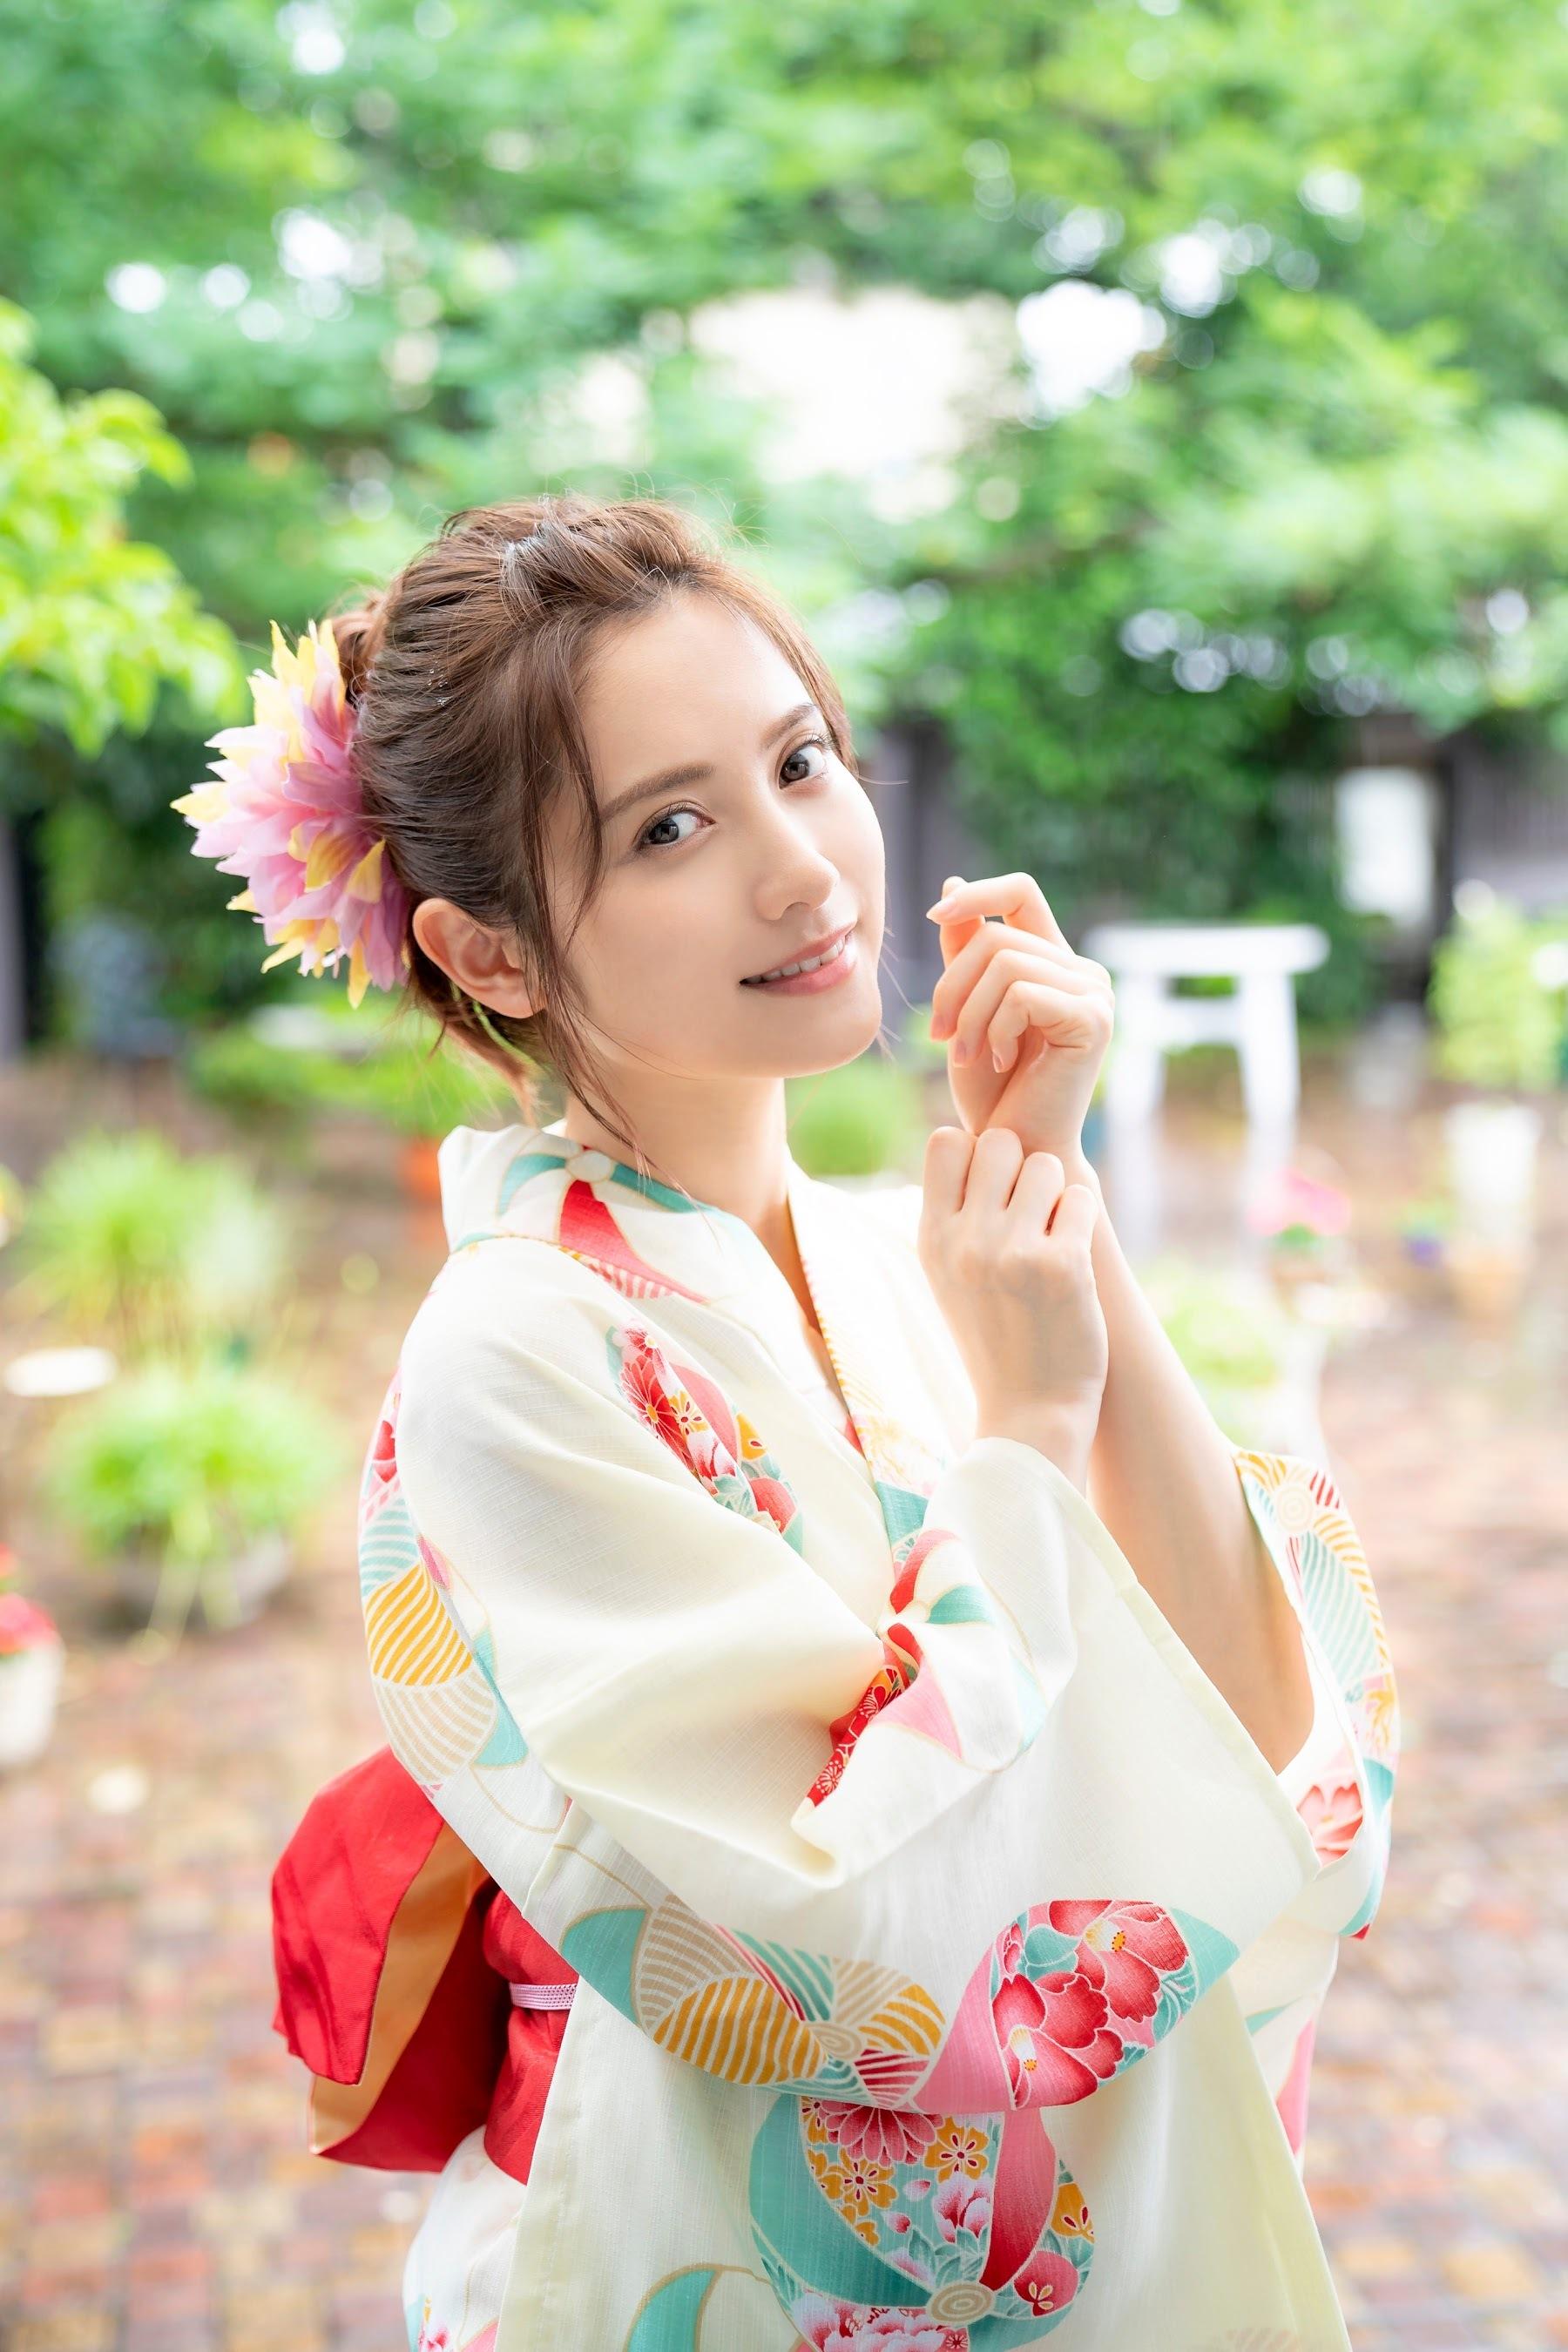 桃月梨子-Young Champion2021第三十三期  高清套图 第20张